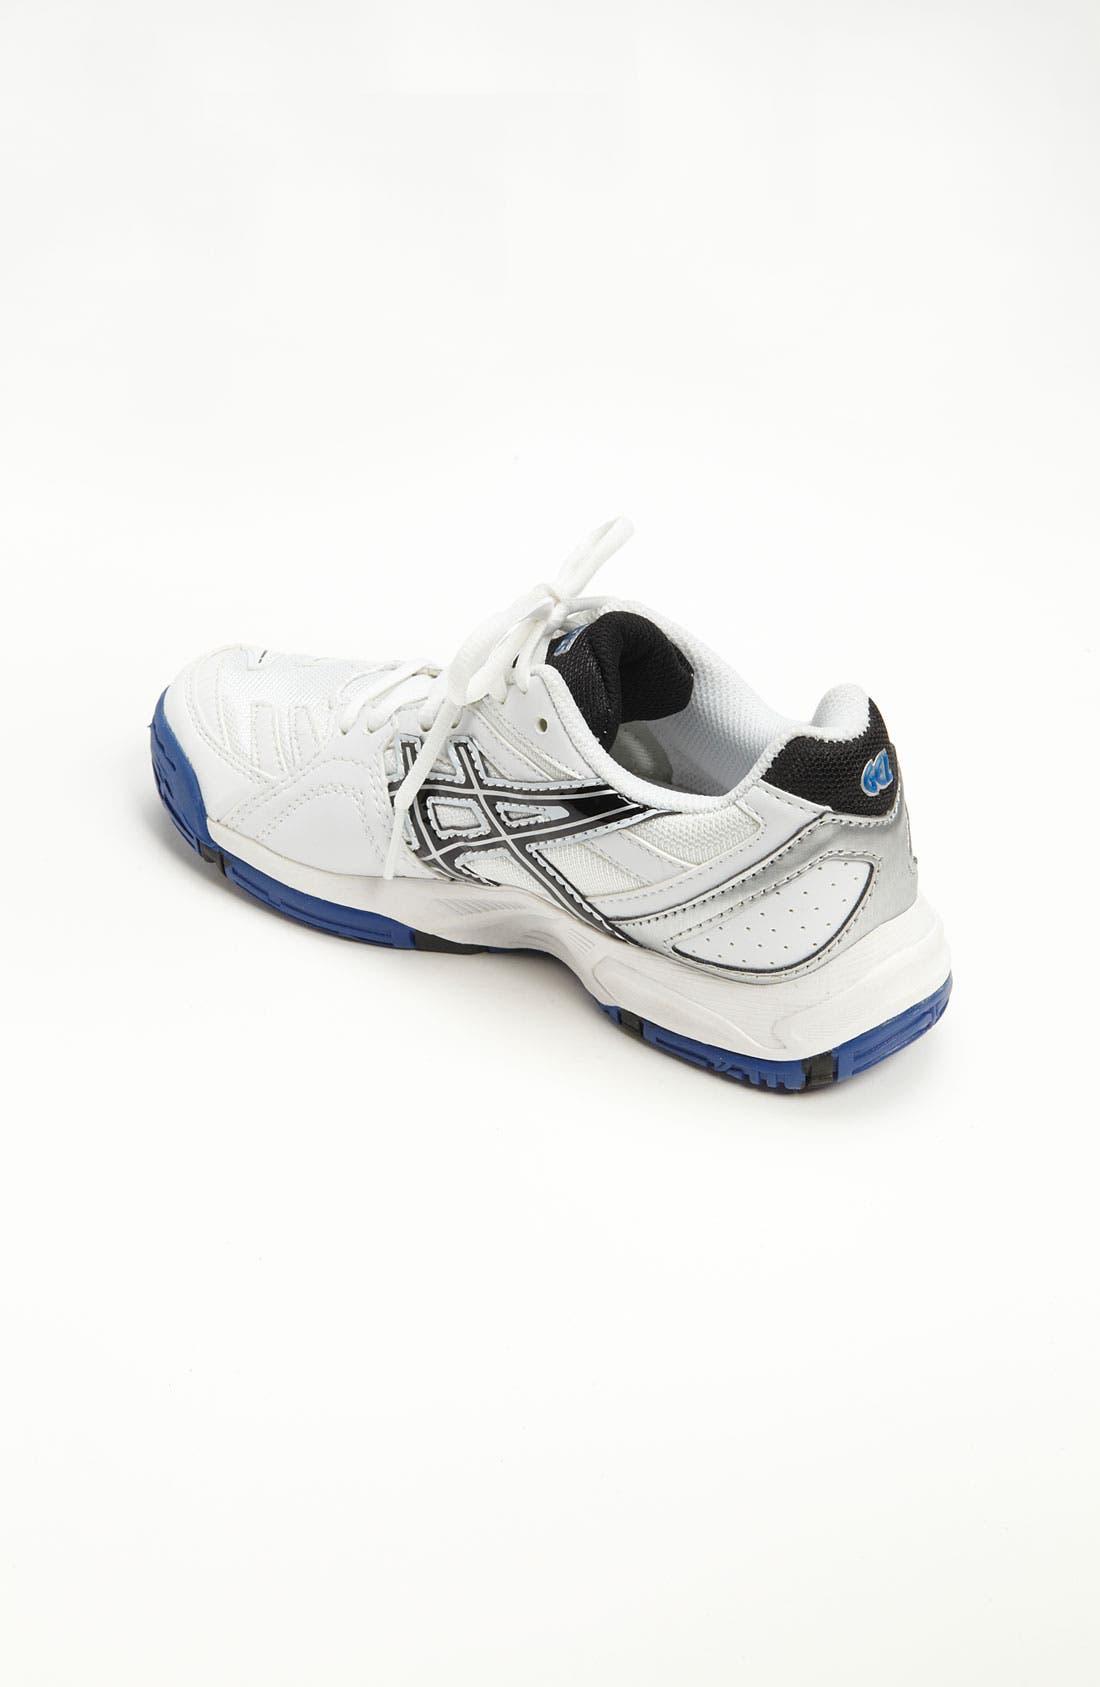 Alternate Image 2  - ASICS® 'GEL-Resolution' Tennis Shoe (Little Kid & Big Kid)